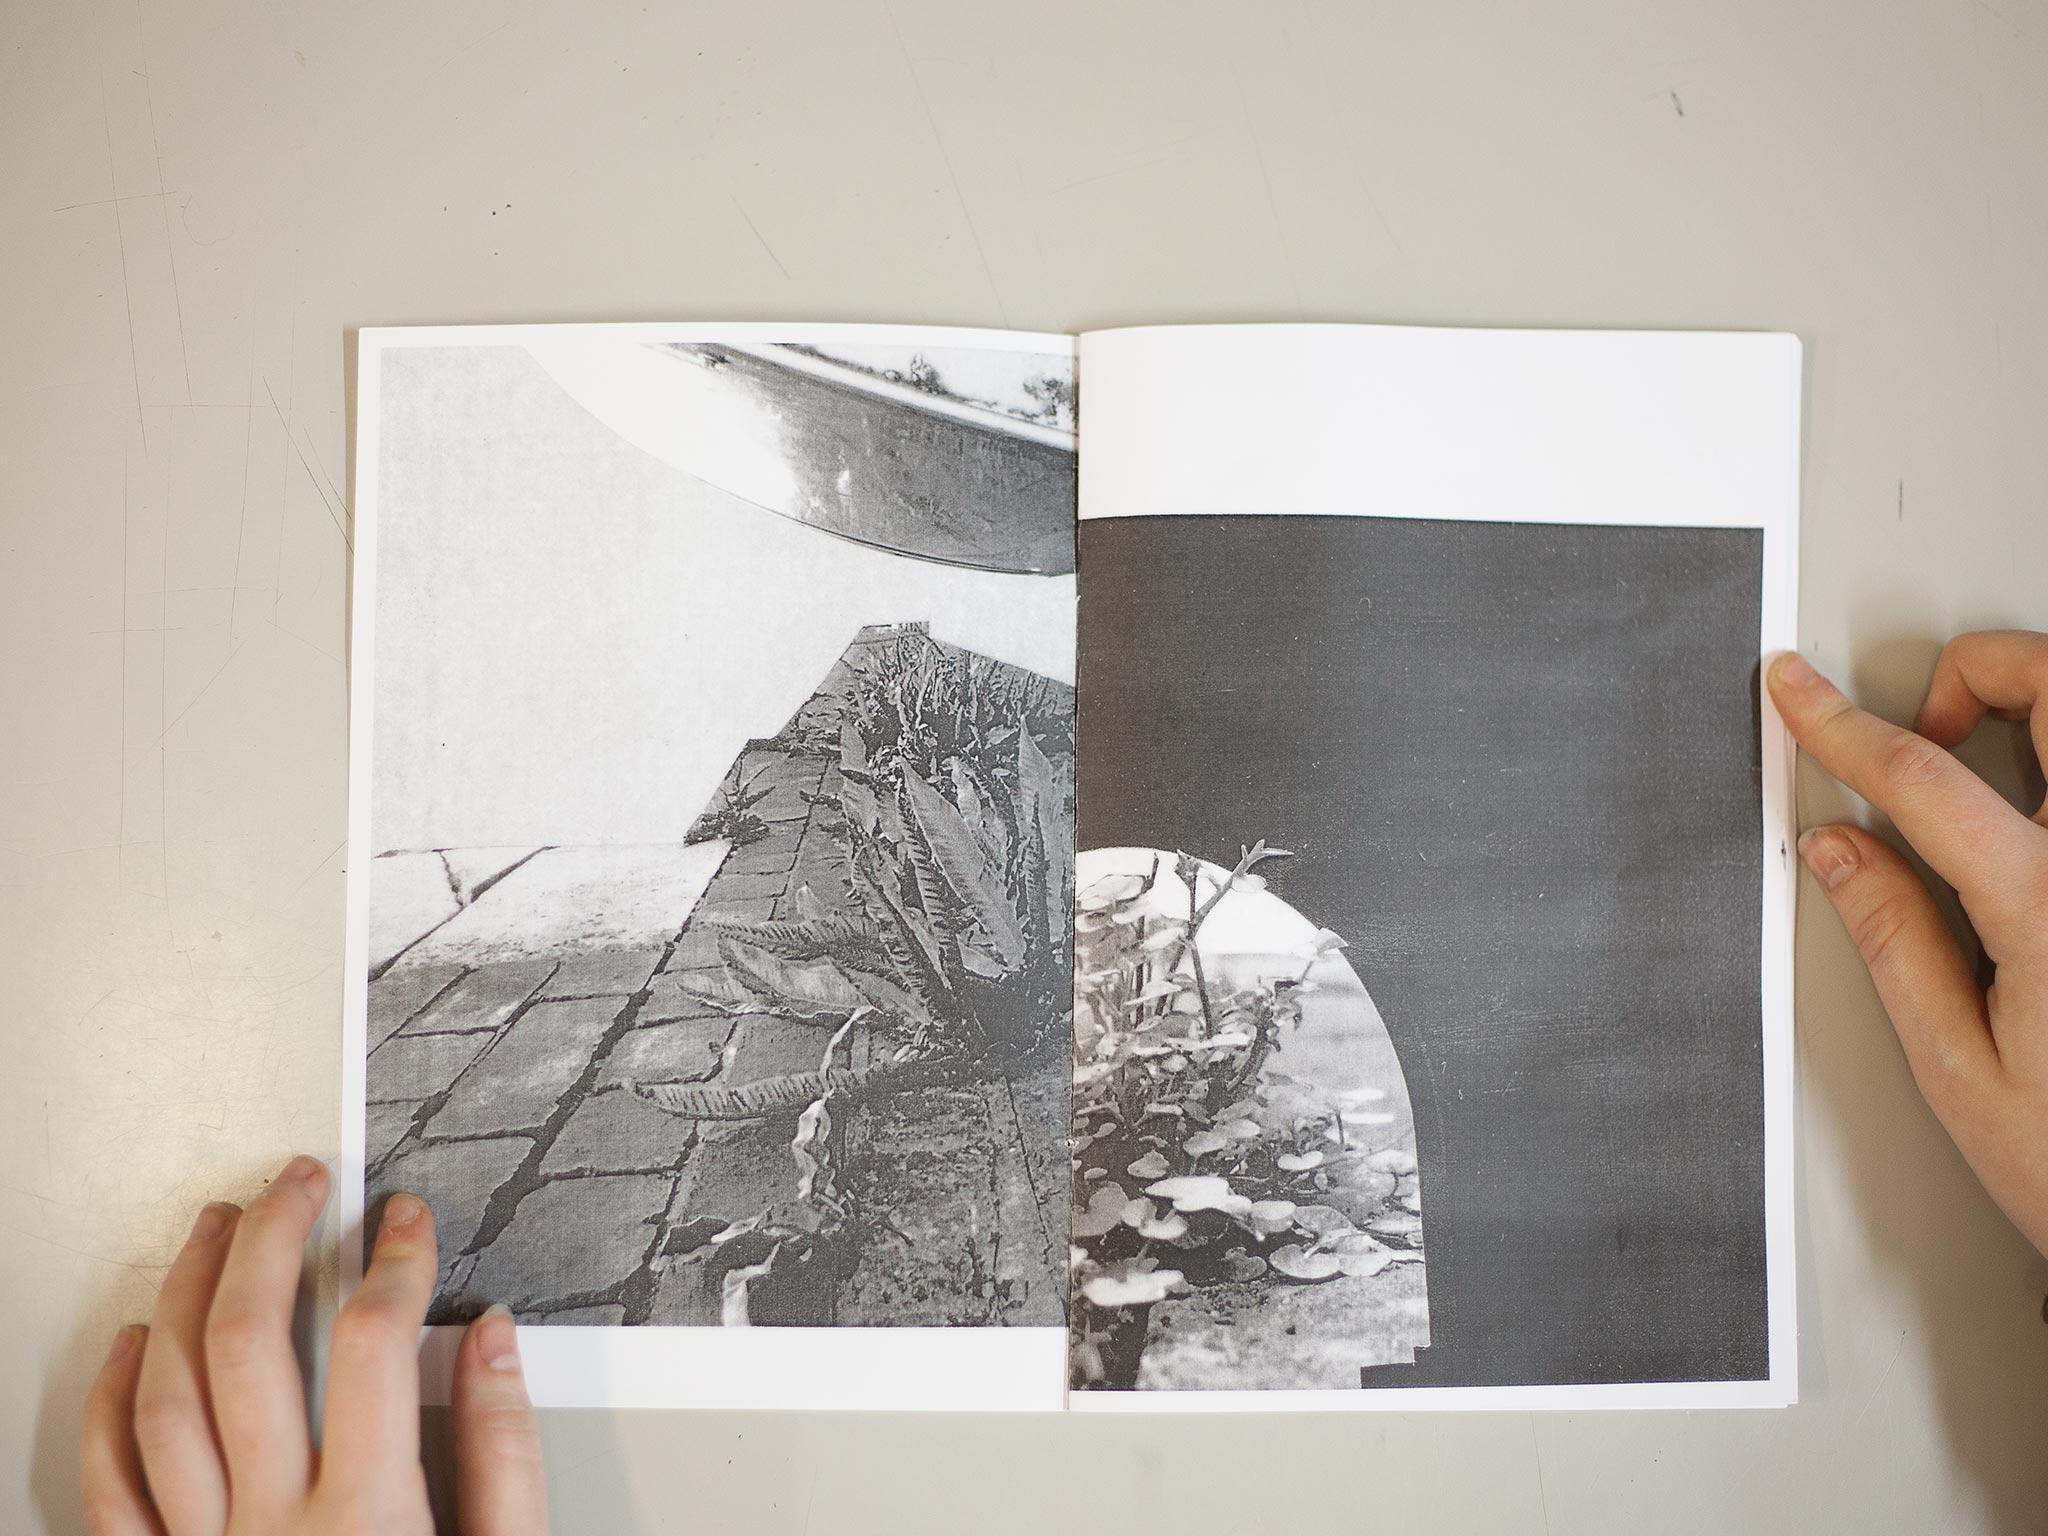 paula-roush-st-charles-centre-photobook-workshops-04